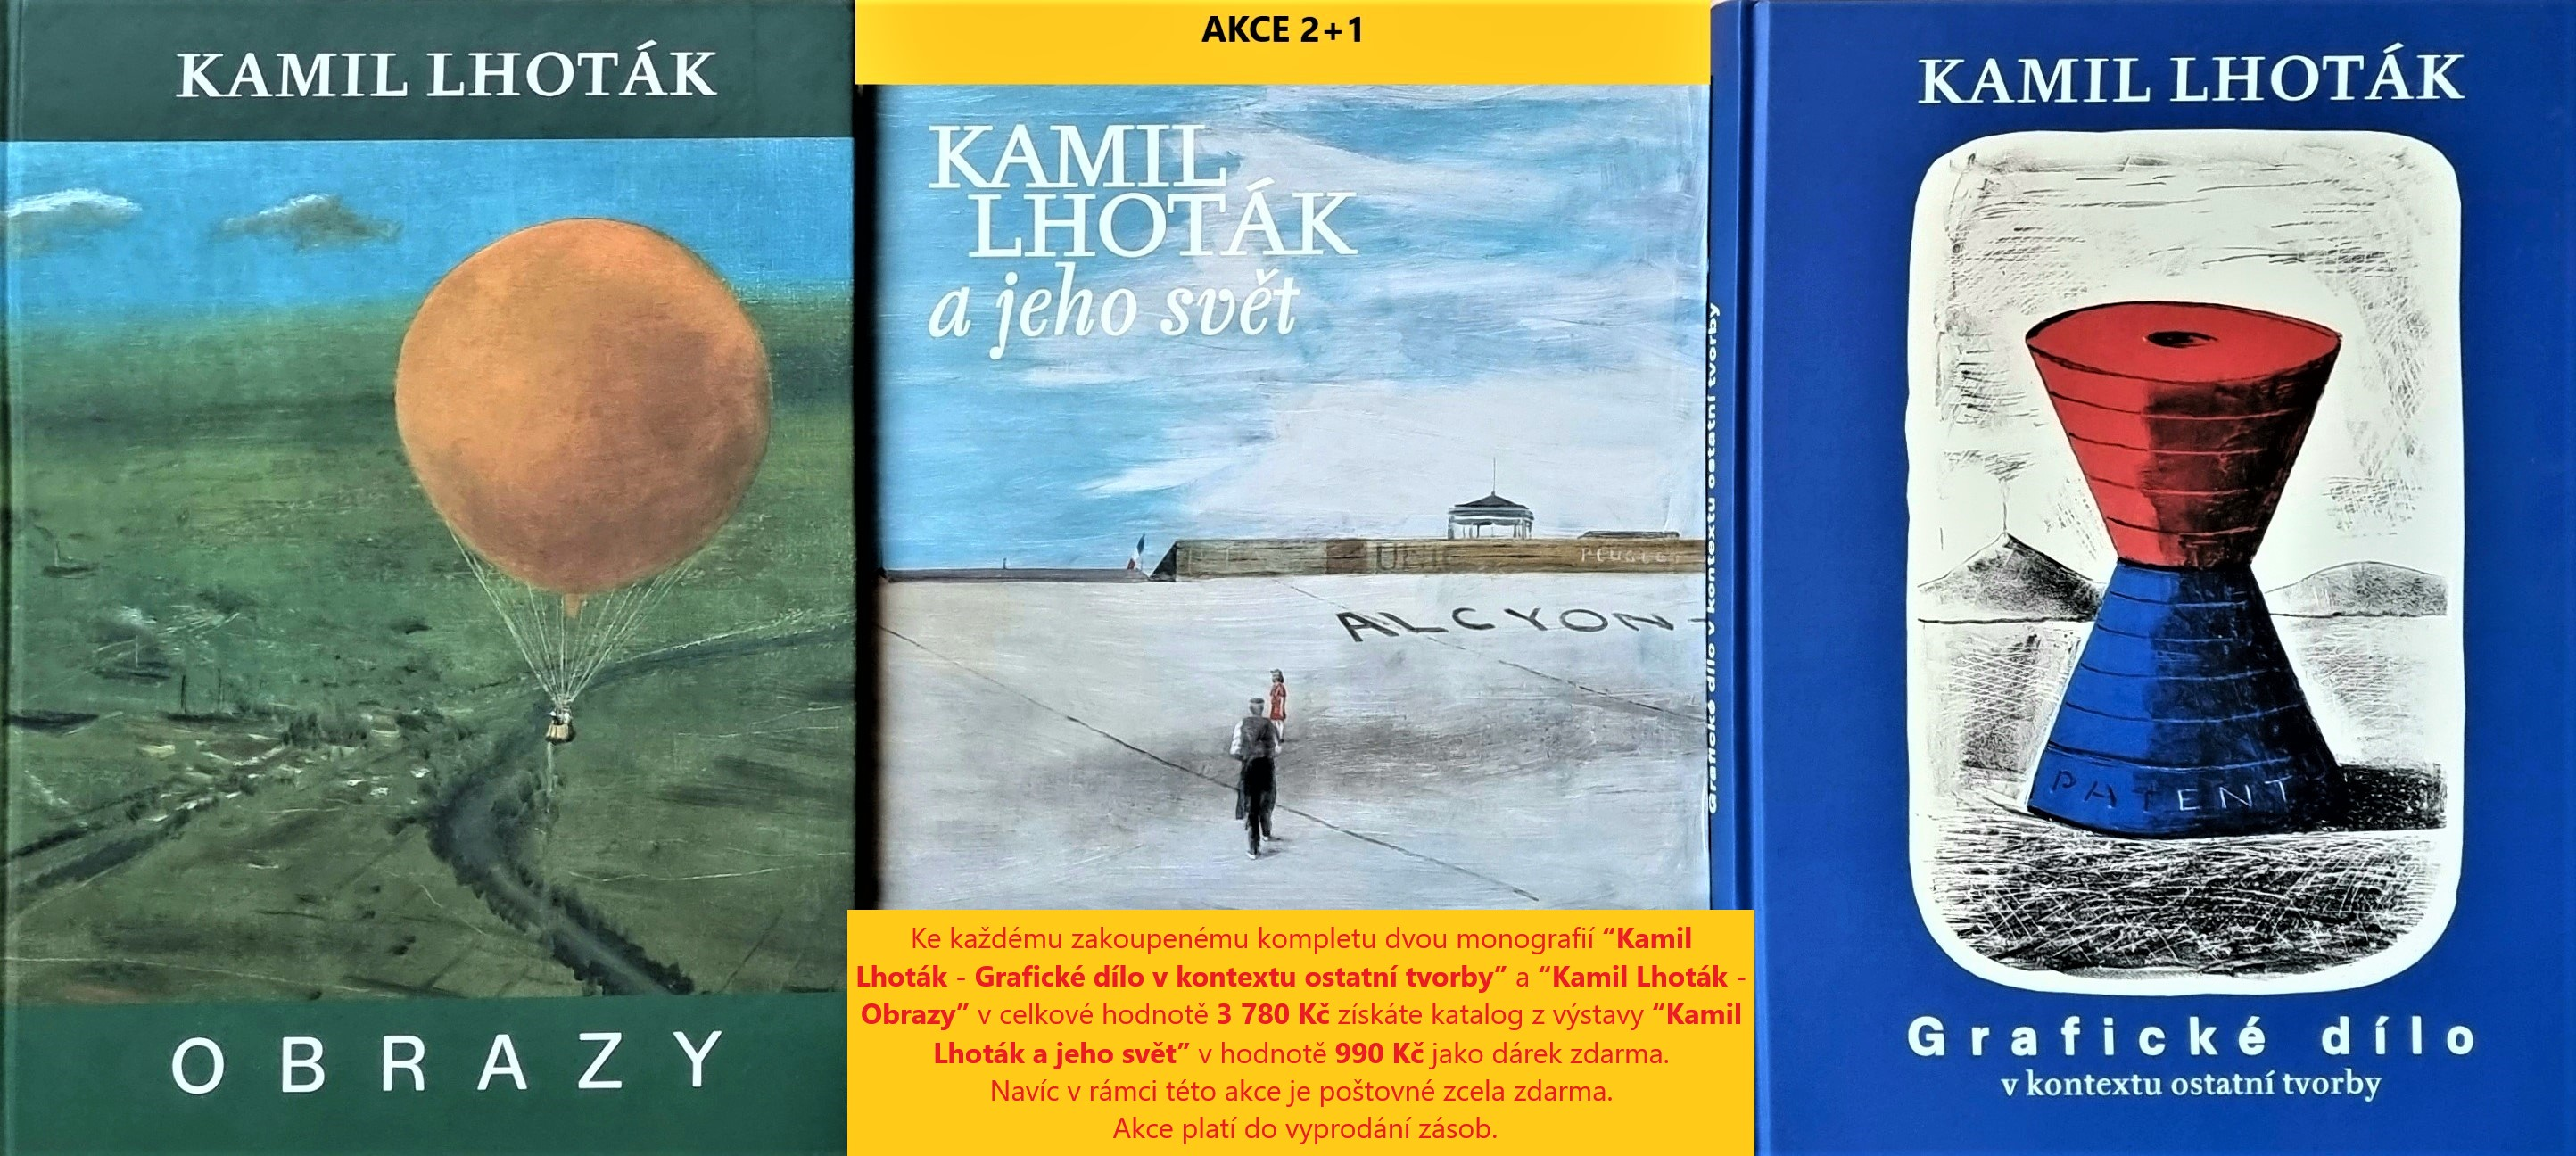 Kamil Lhoták -Akce 2+1